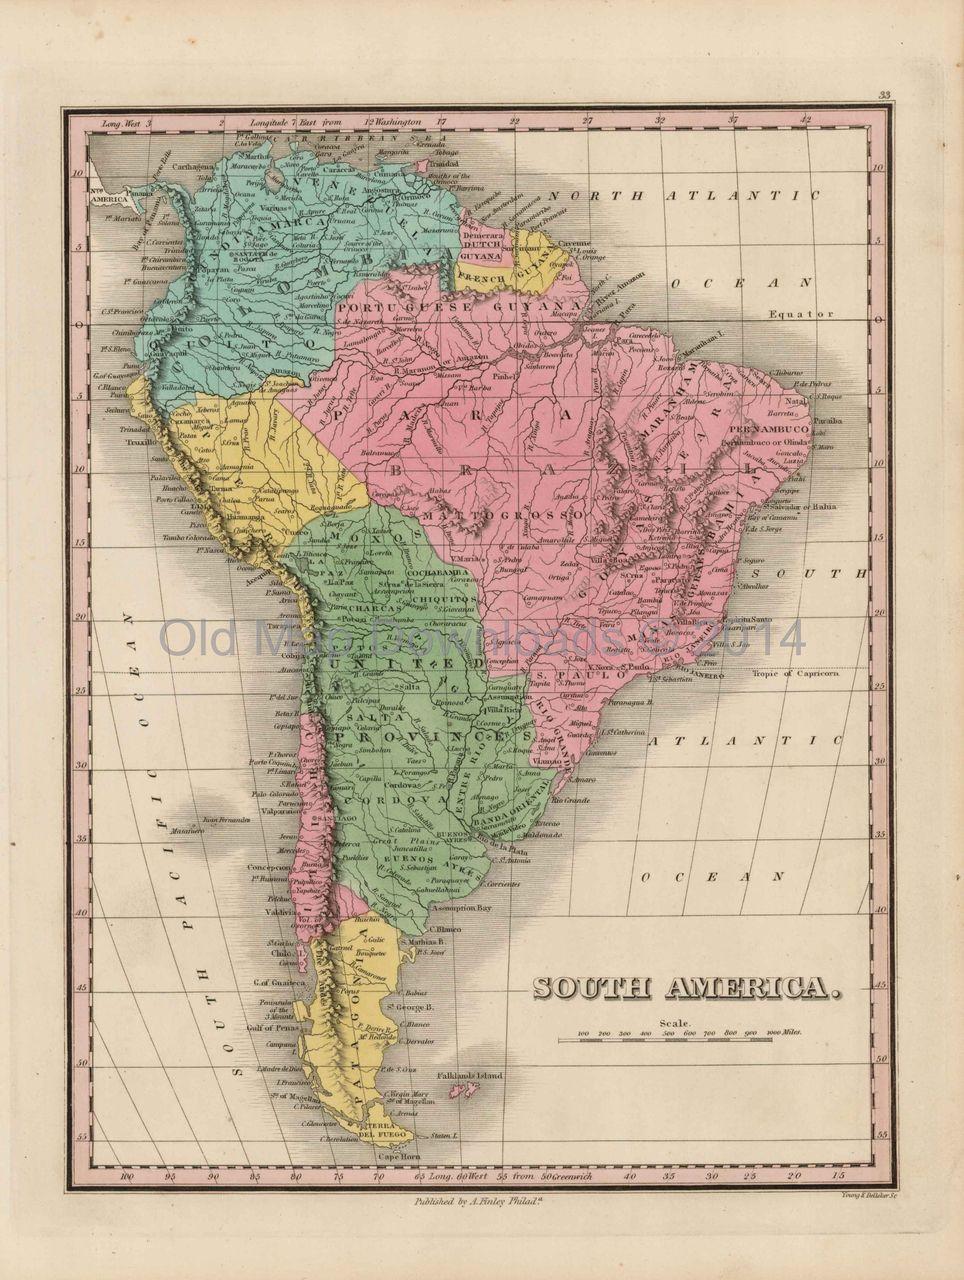 old map downloads south america old map finley 1824 digital 31b4a0de9c4a4e85697702604e54cd7c 127367495688589543 download amerikan map major tourist